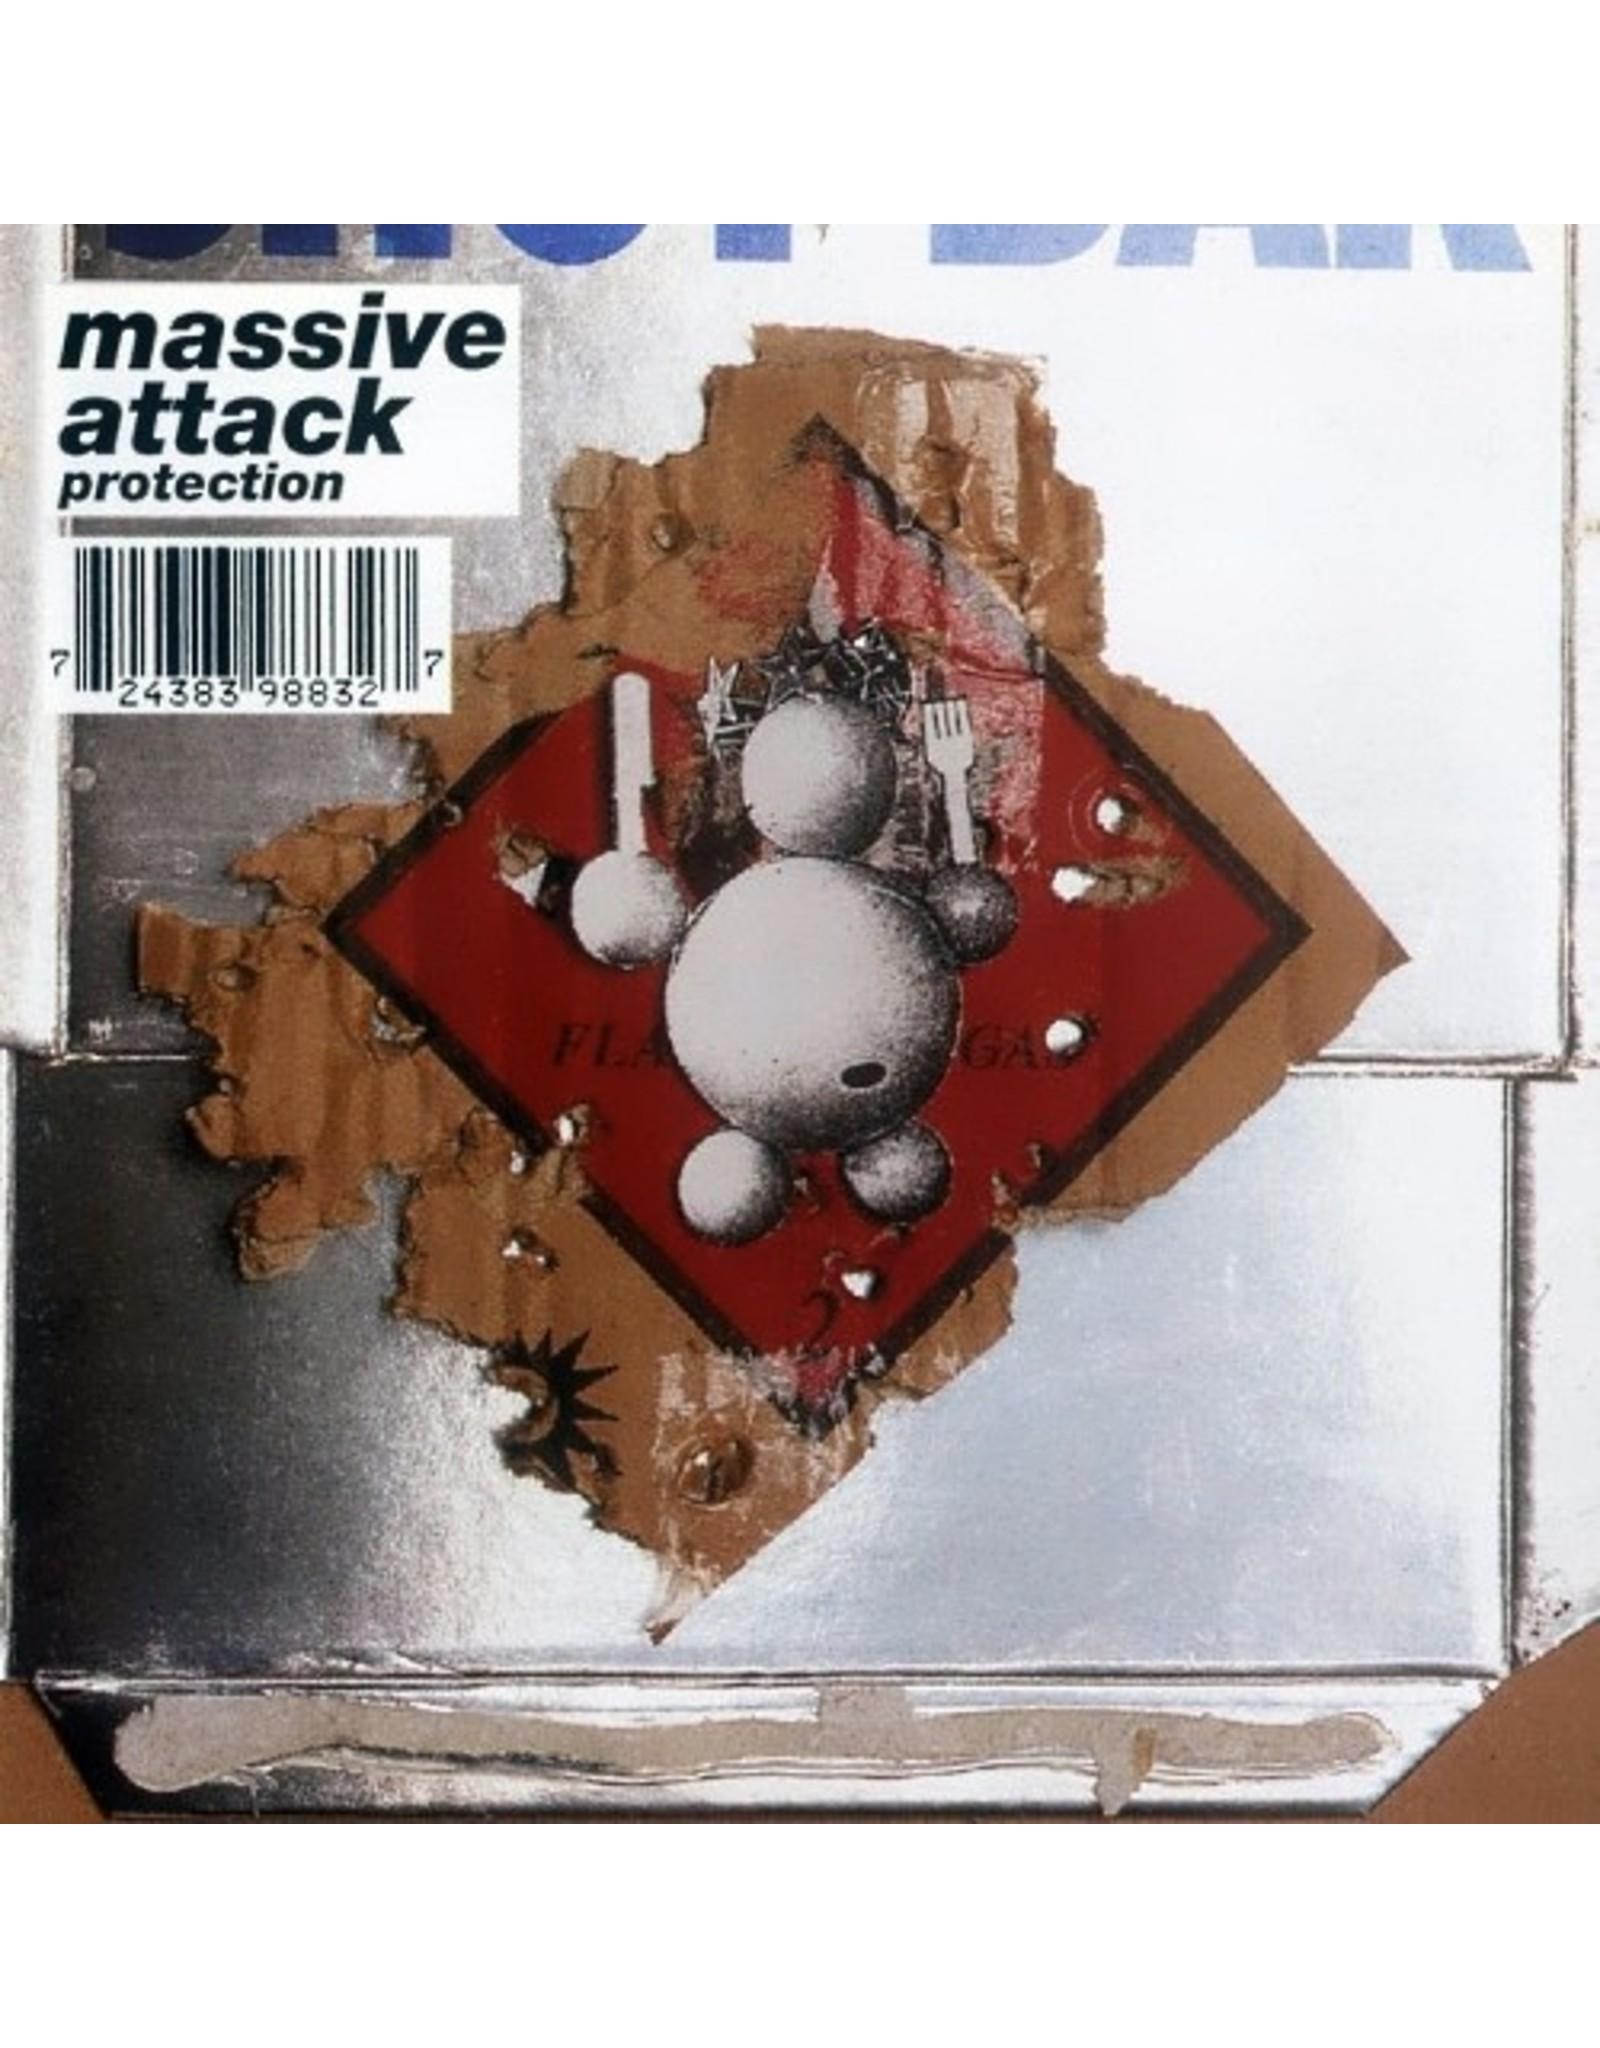 New Vinyl Massive Attack - Protection LP